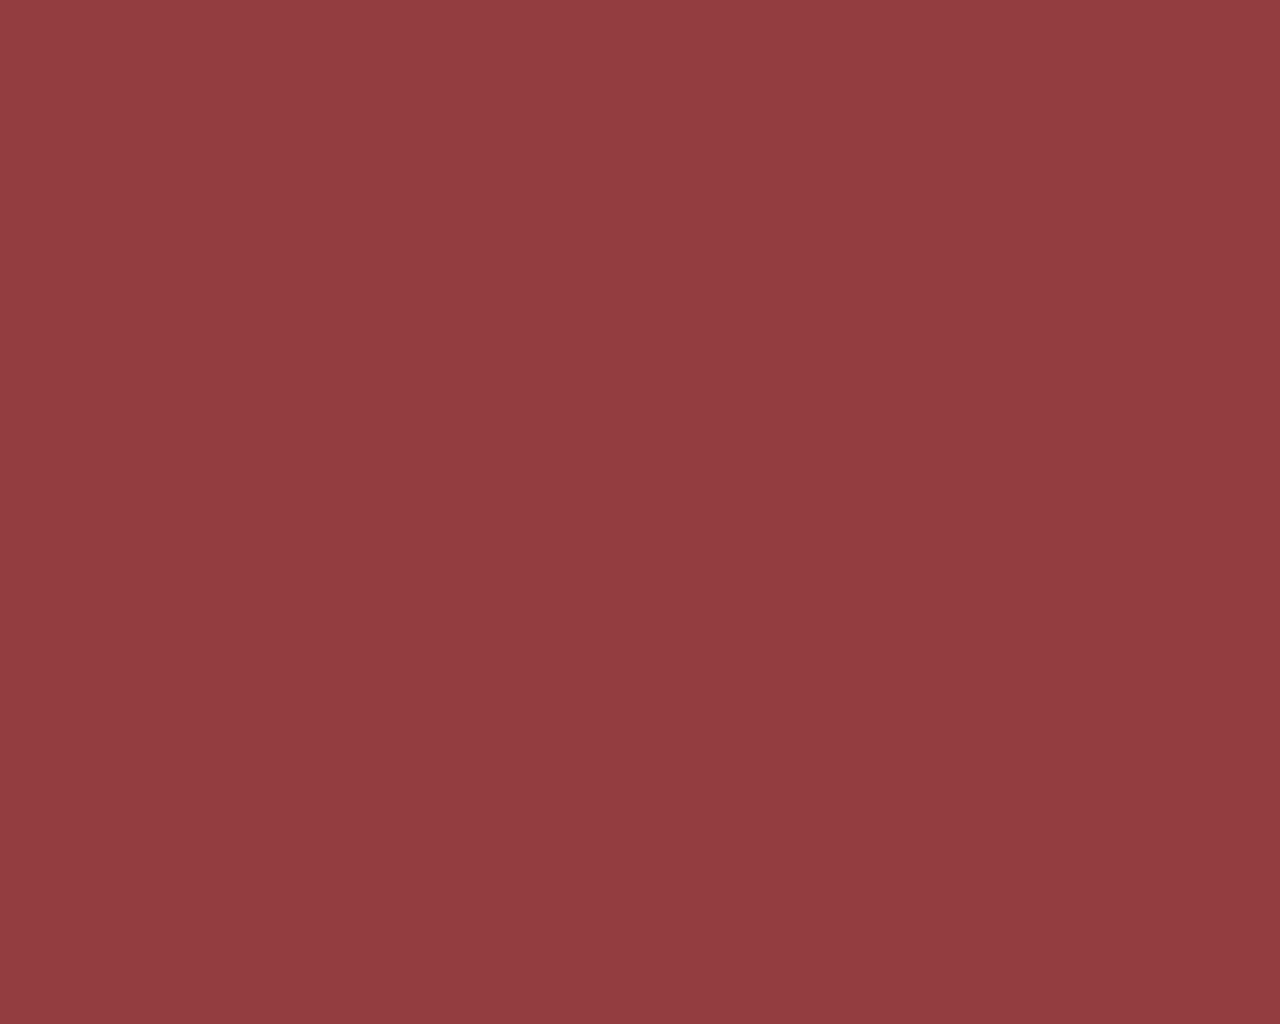 1280x1024 Smokey Topaz Solid Color Background